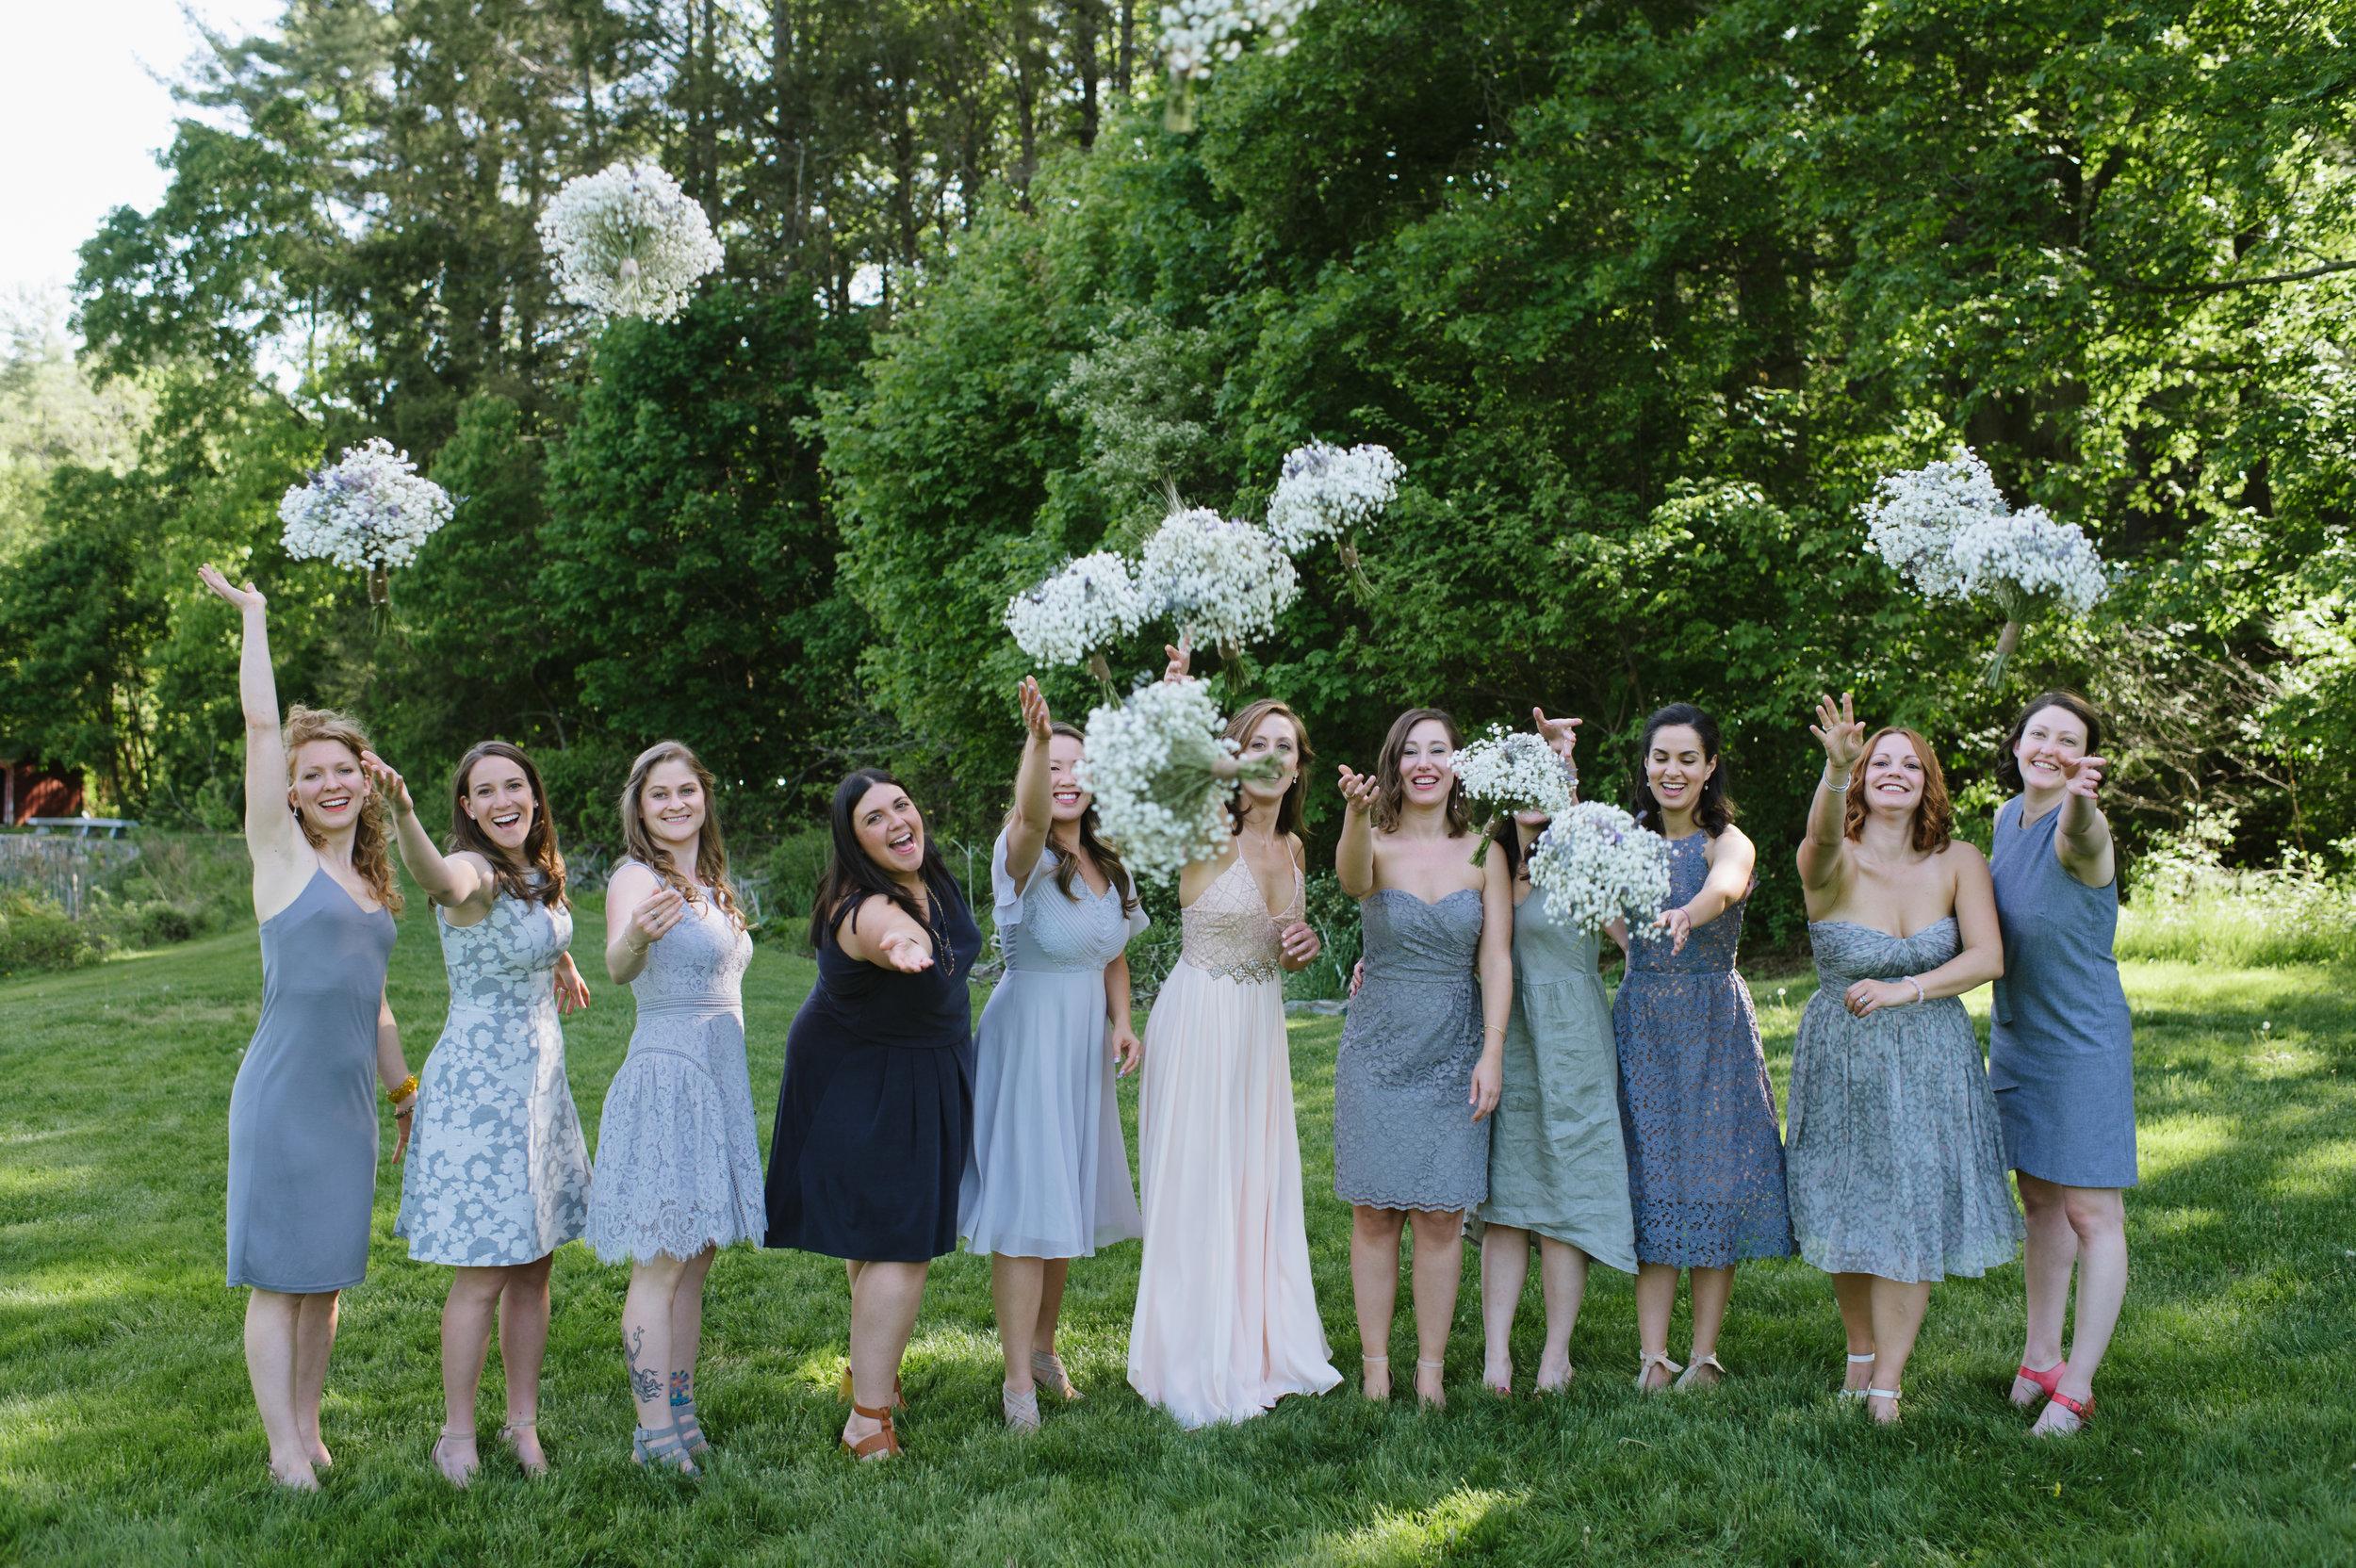 Candid-Wedding-Photography-Boston016.jpg